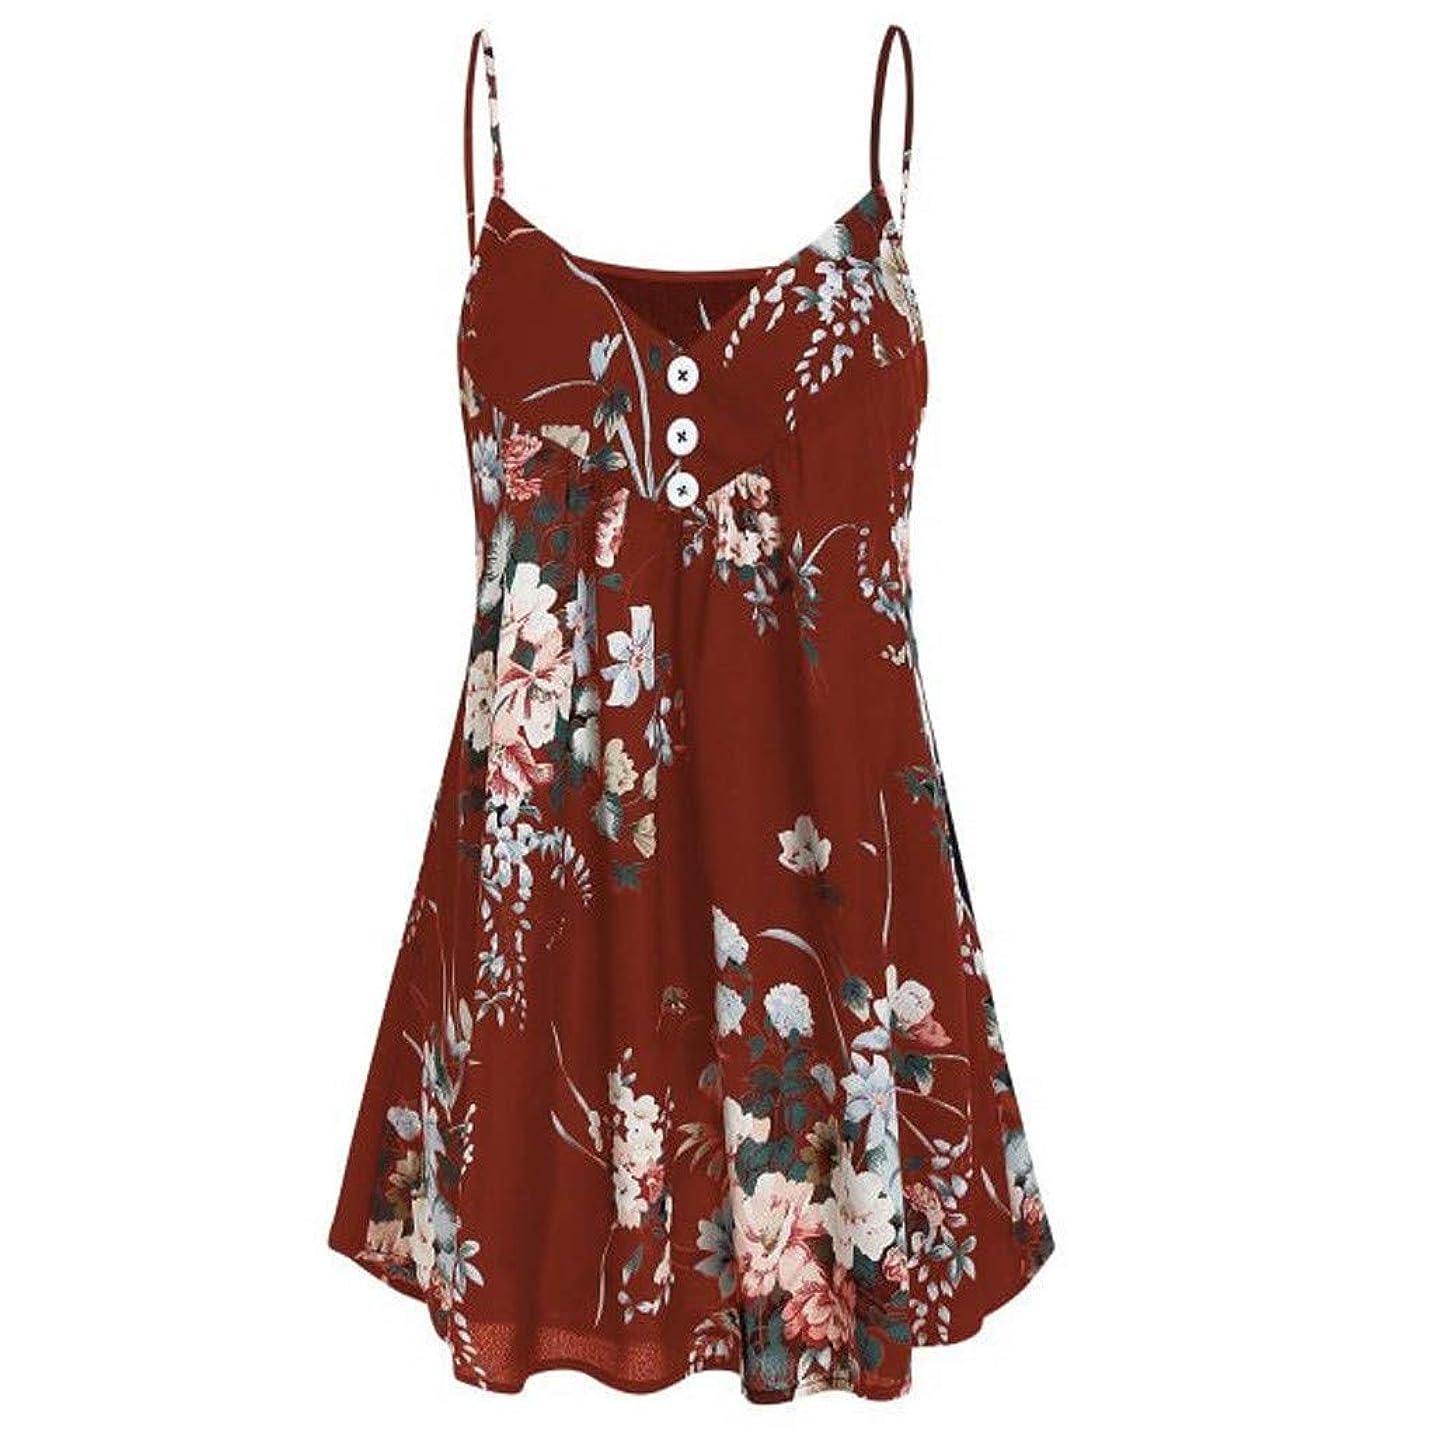 Sllve-hive Womens Chiffon Floral Printed Button Vest Casual V-Neck Ruffle Hem T-Shirt Blouse Tank Tops